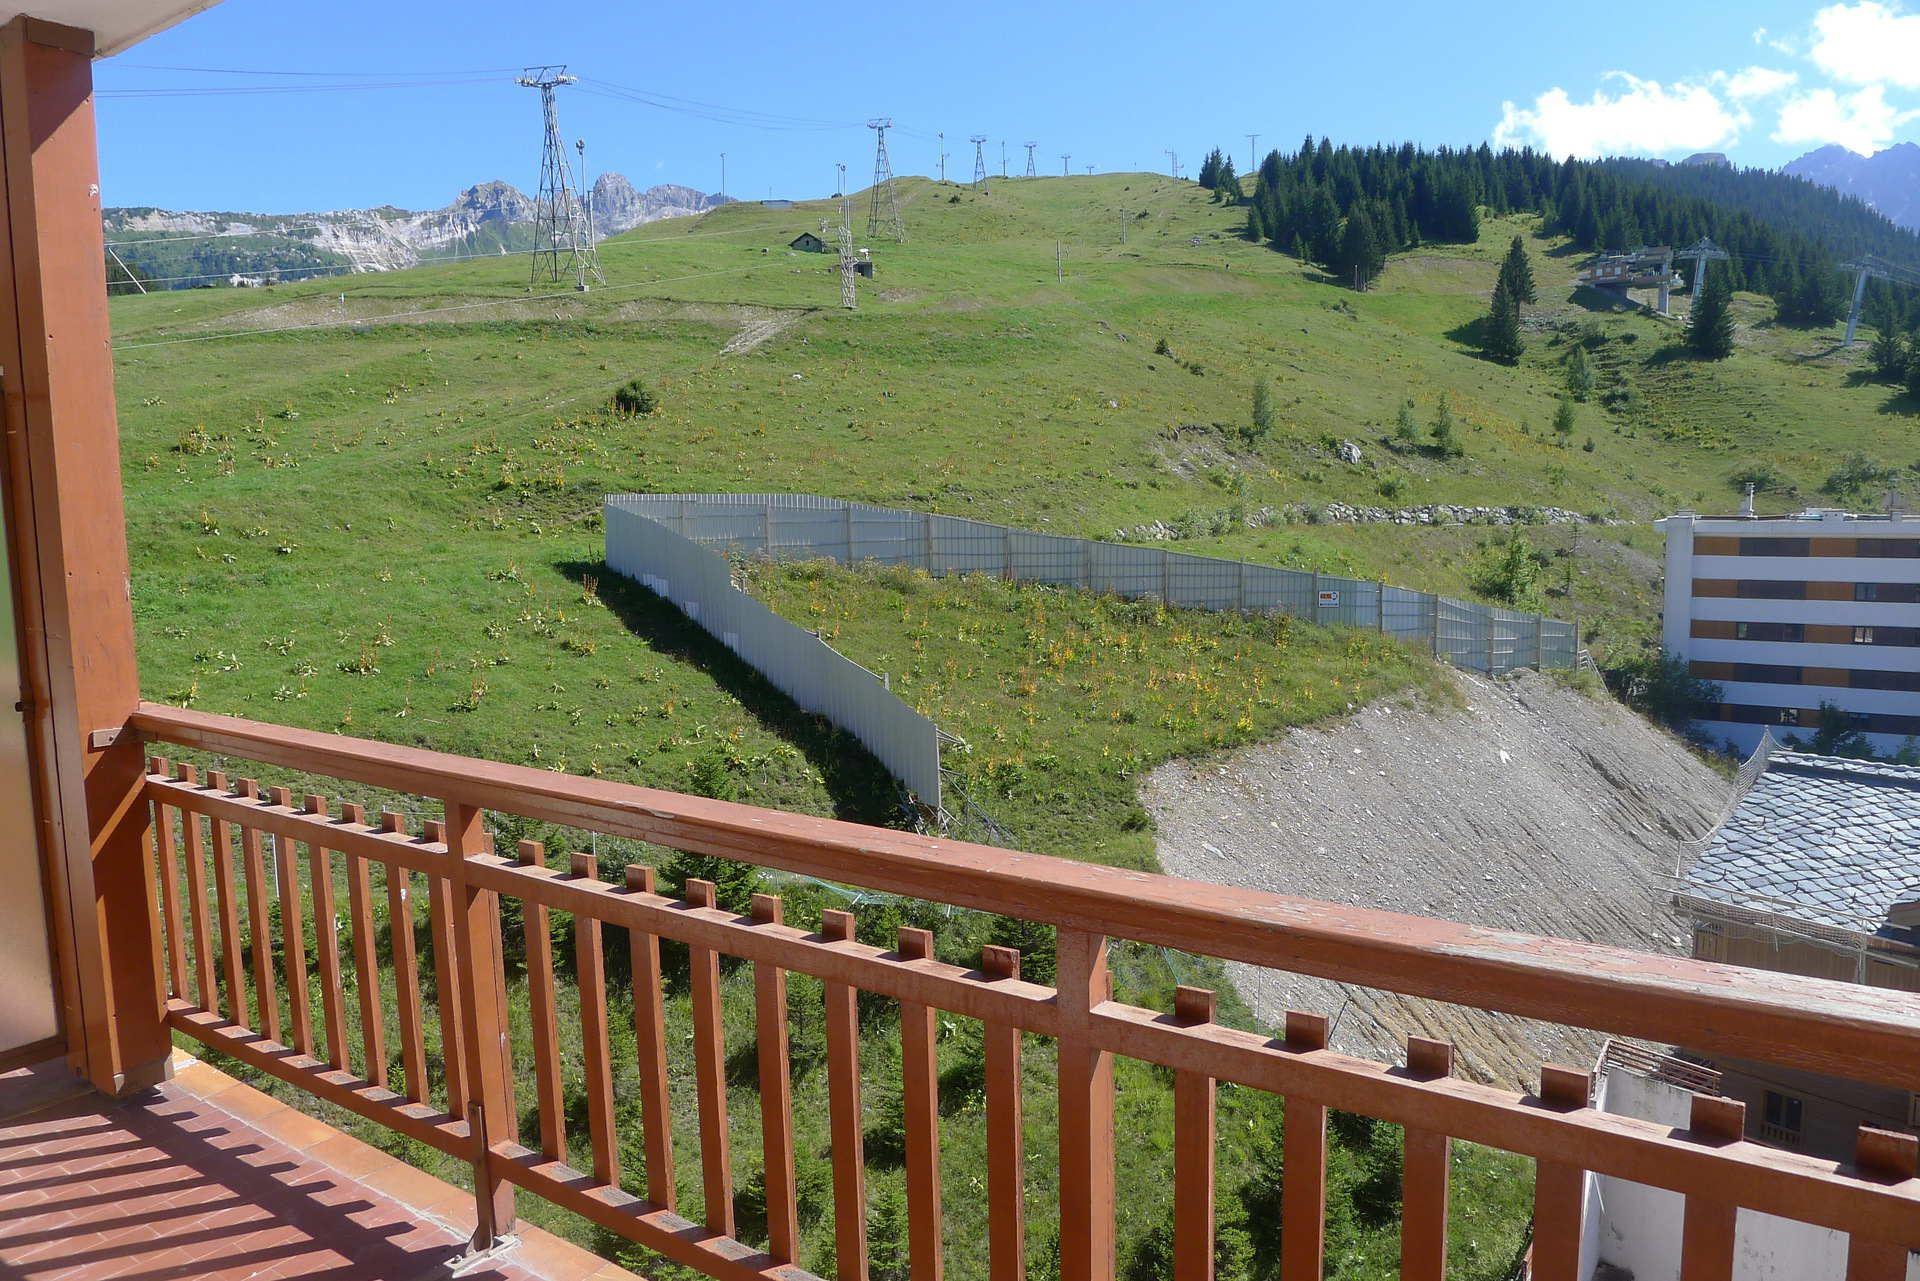 Studio 4 people ski-in ski-out / RESIDENCE 1650 26 (mountain of charm)